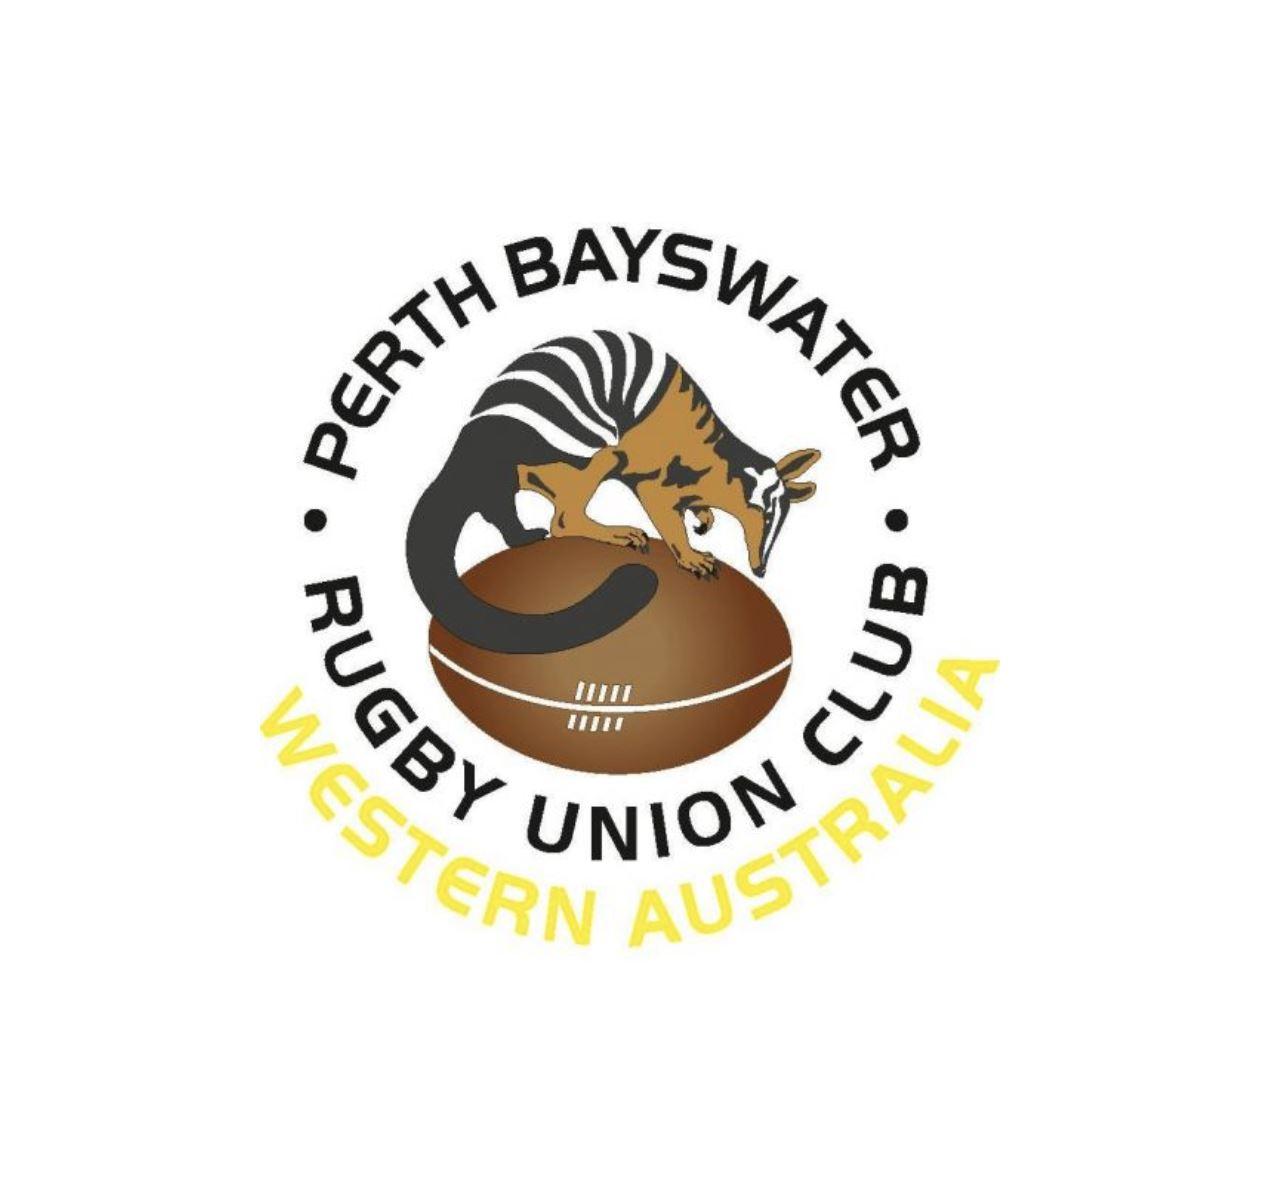 Perth Bayswater Rugby Union Club - Perth Bayswater - Premier Grade